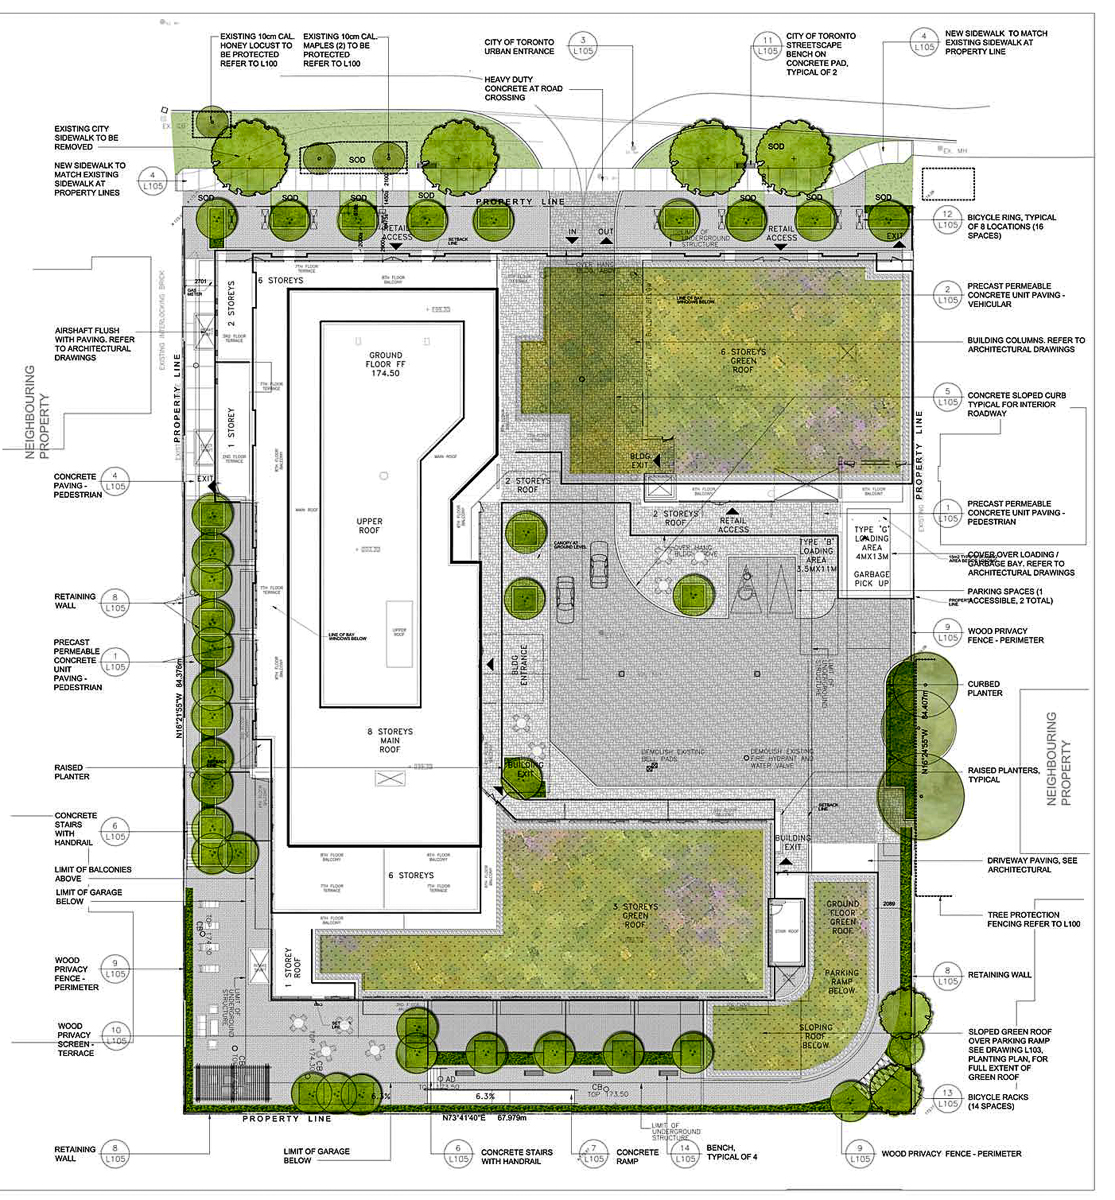 20151210-L101 Landscape Layout Plan.jpg